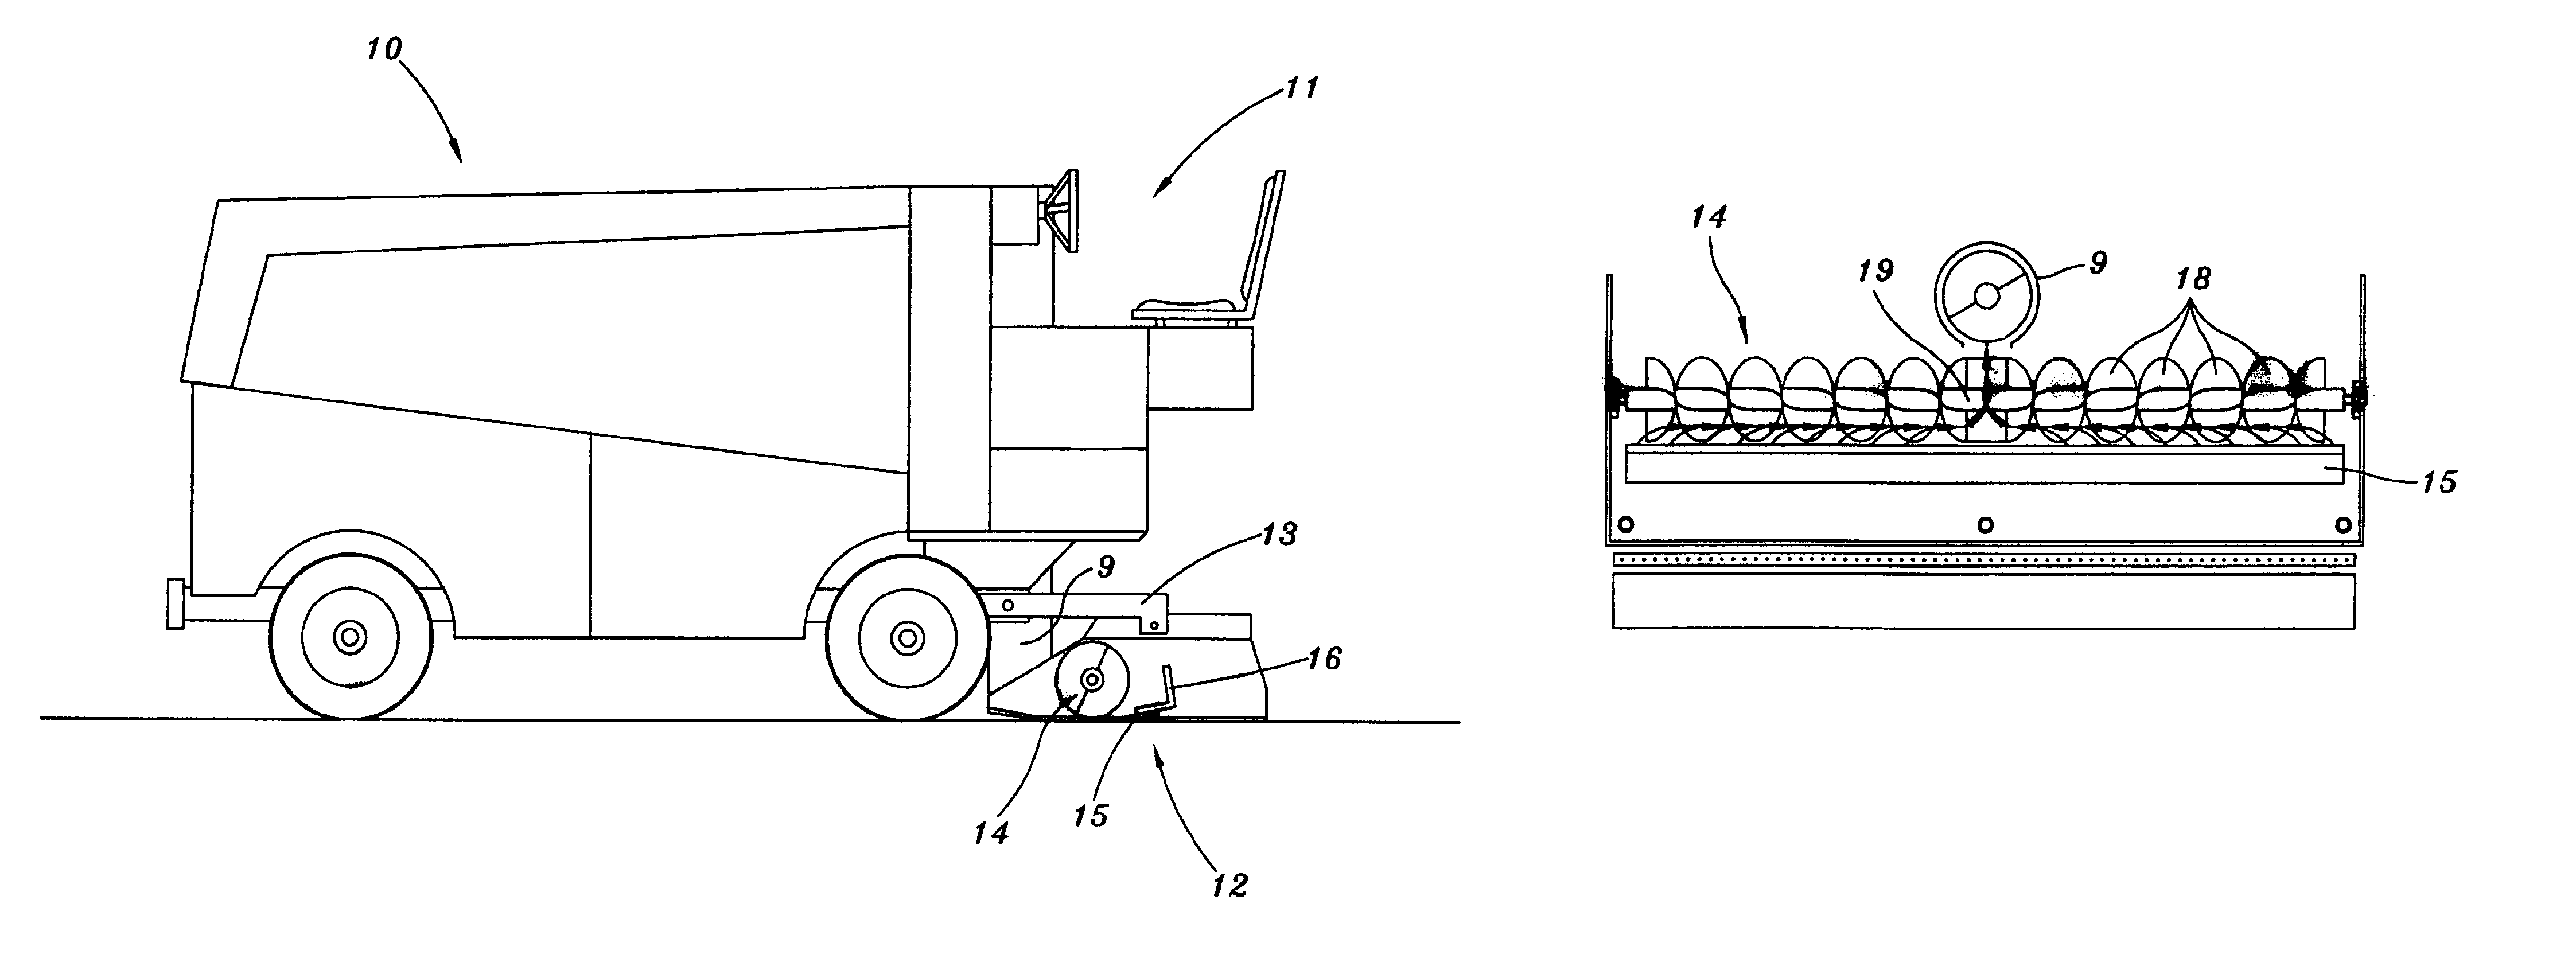 Patent Us7757415 Horizontal Ice Cuttings Conveyor For